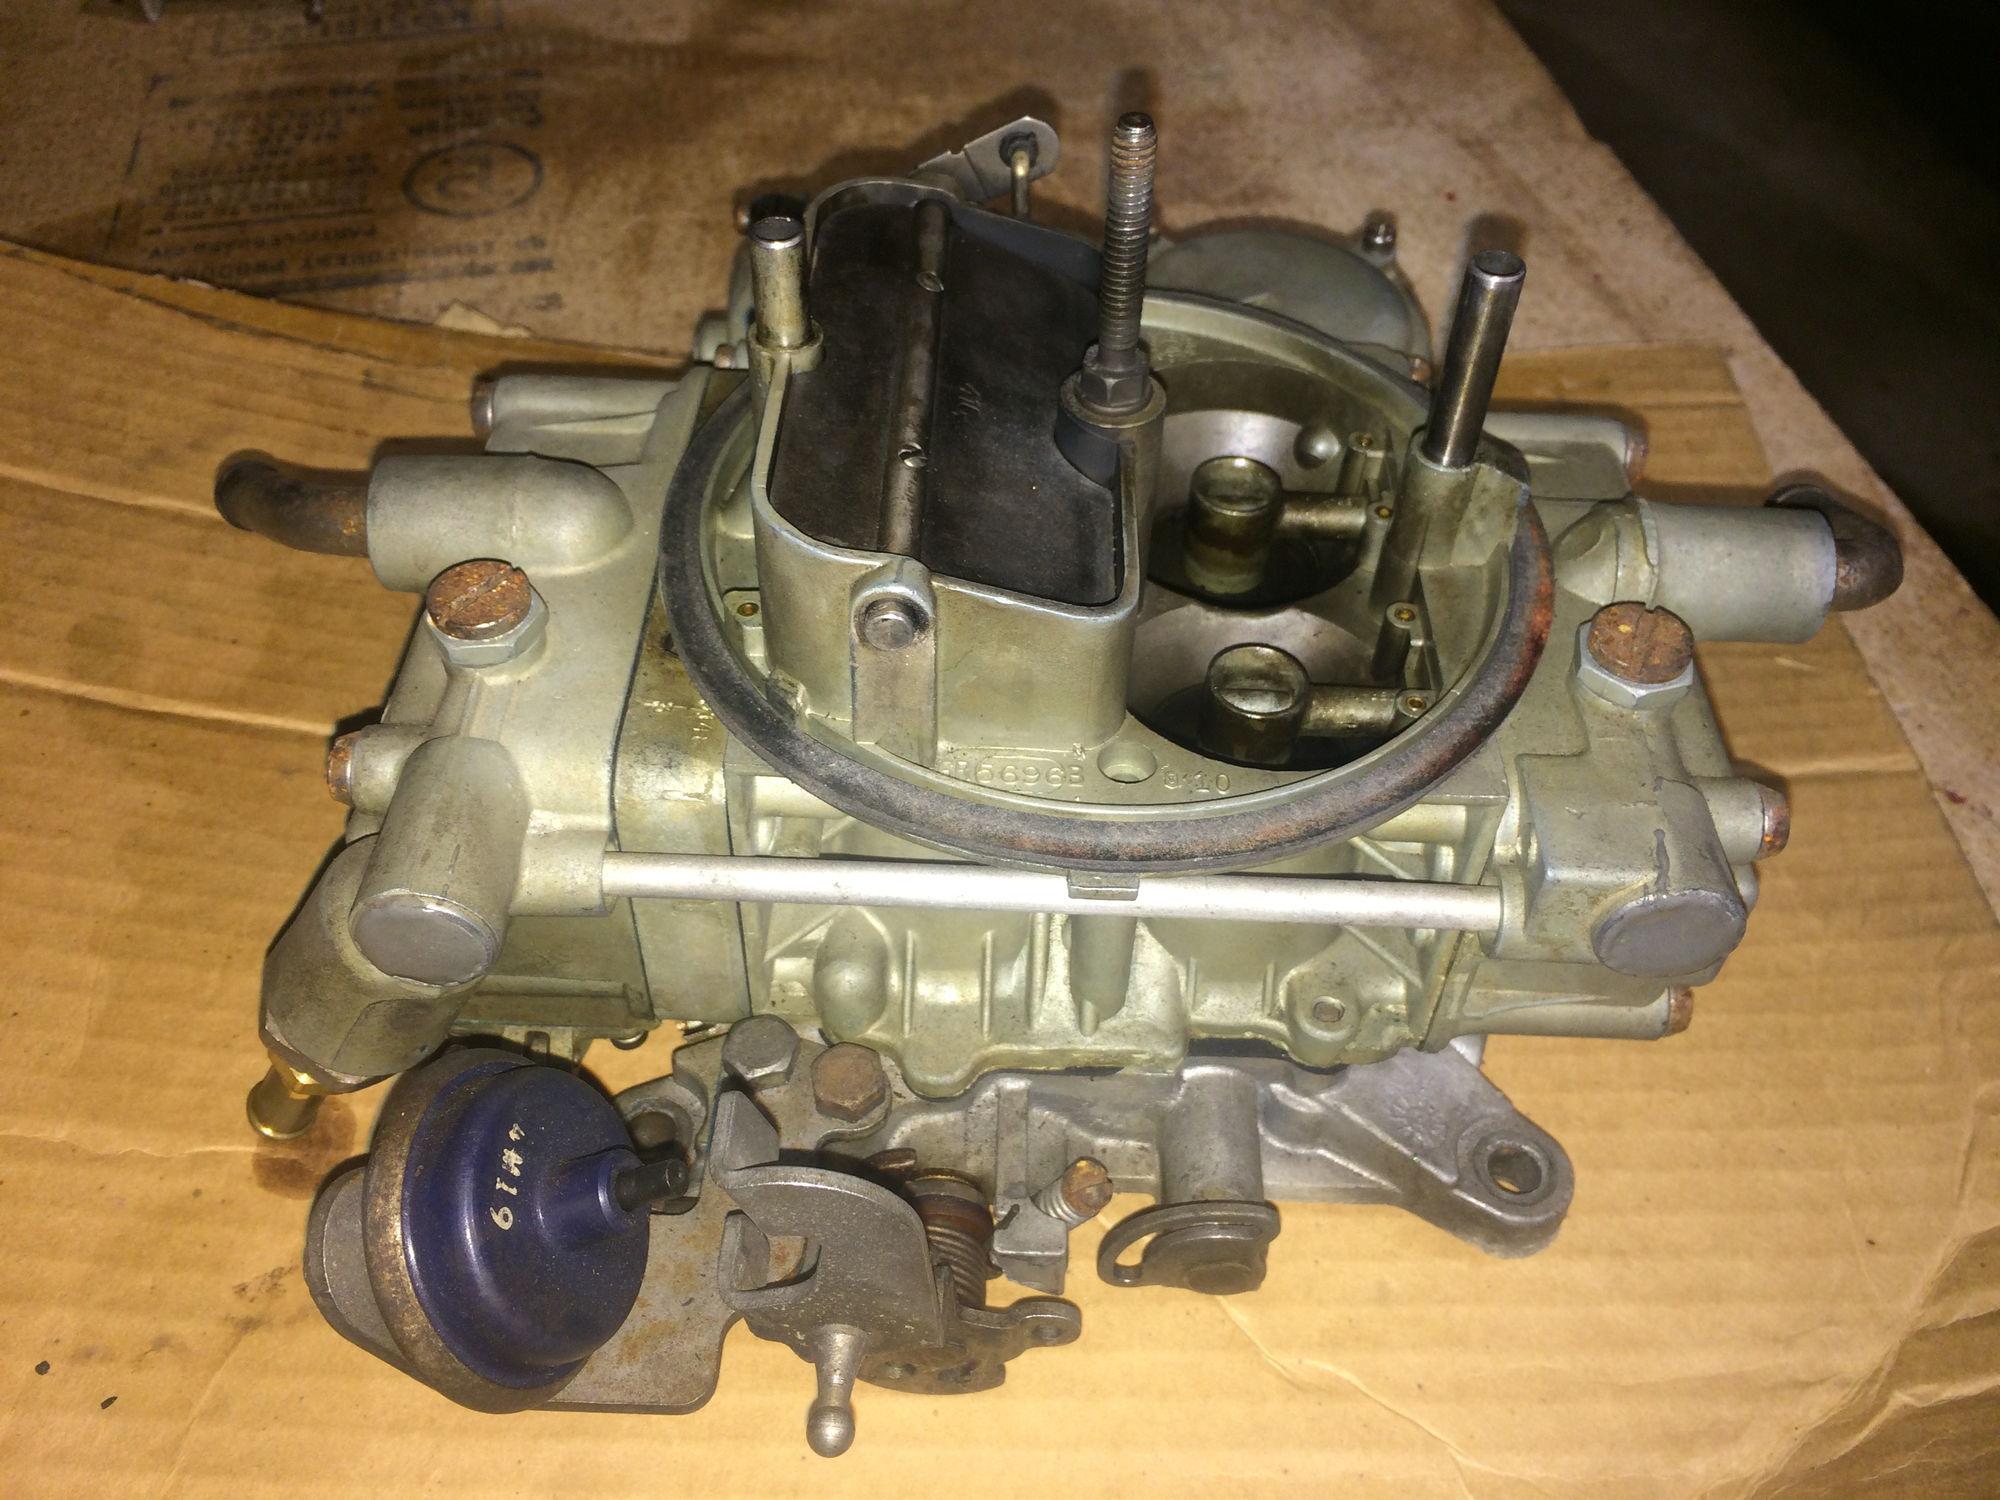 Ford 429 Intake Diagram Electrical Wiring Boss Engine 460ci Circuit Symbols U2022 F 250 460 Vacuum